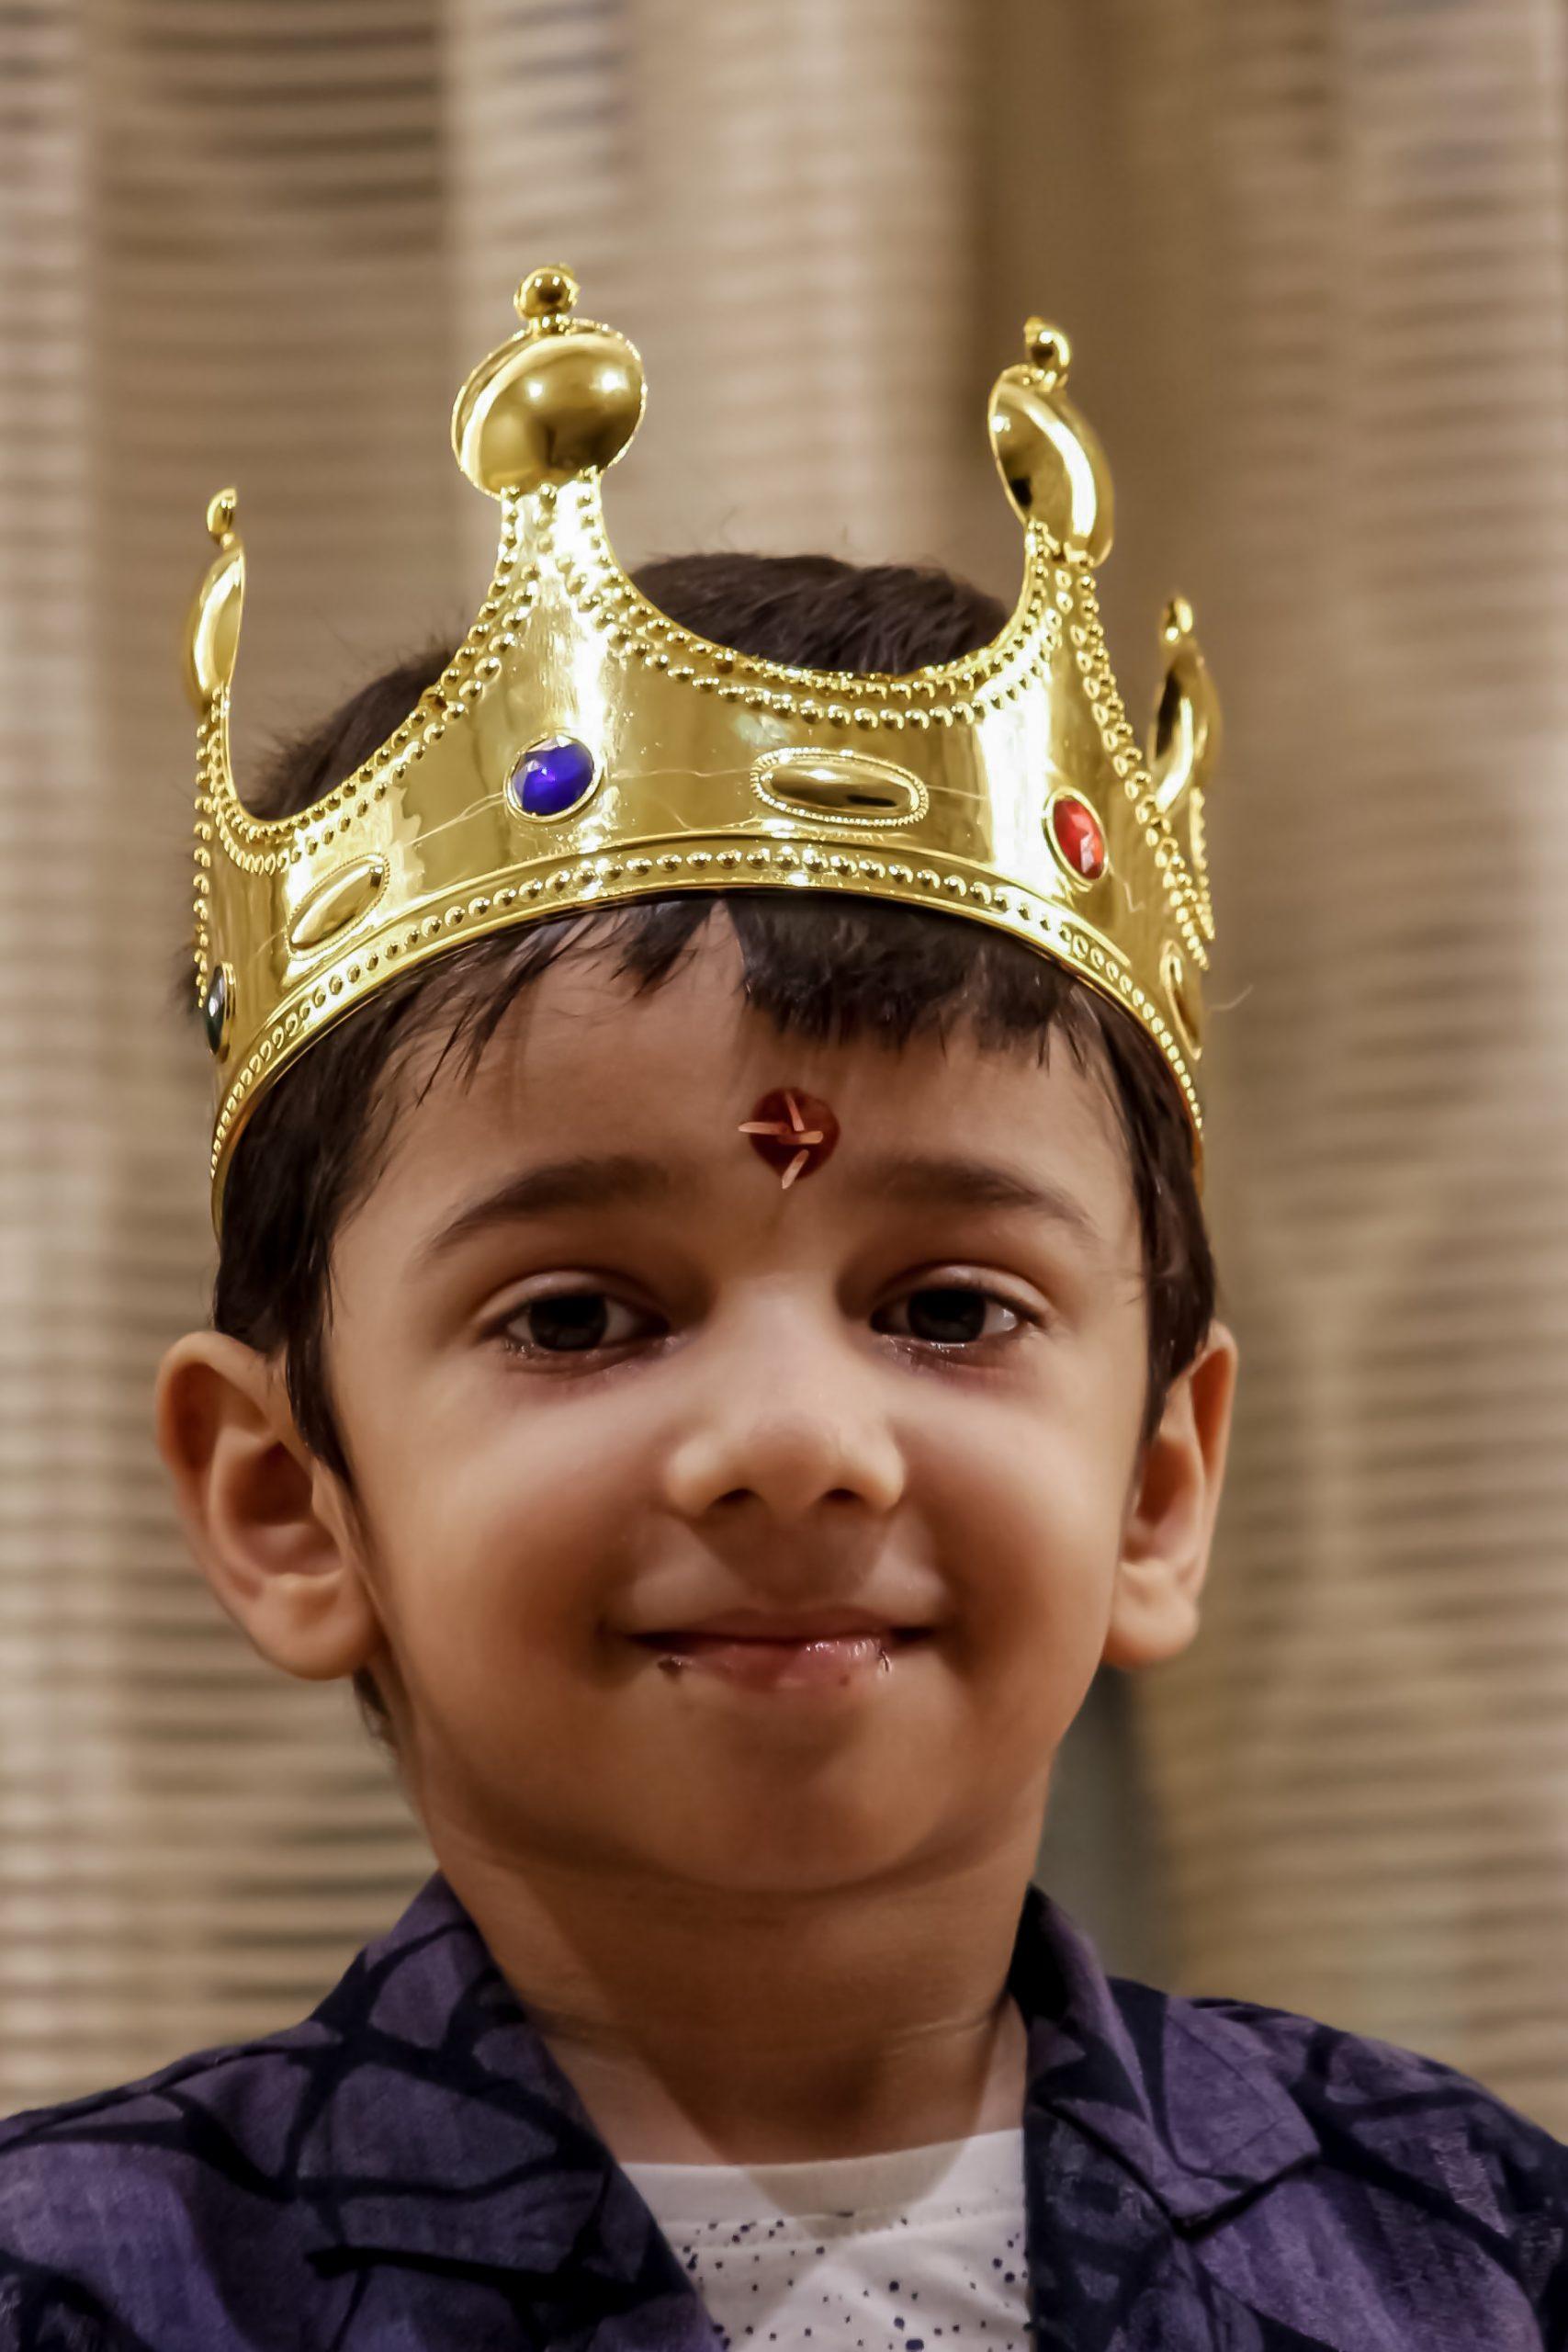 Kid wearing a crown